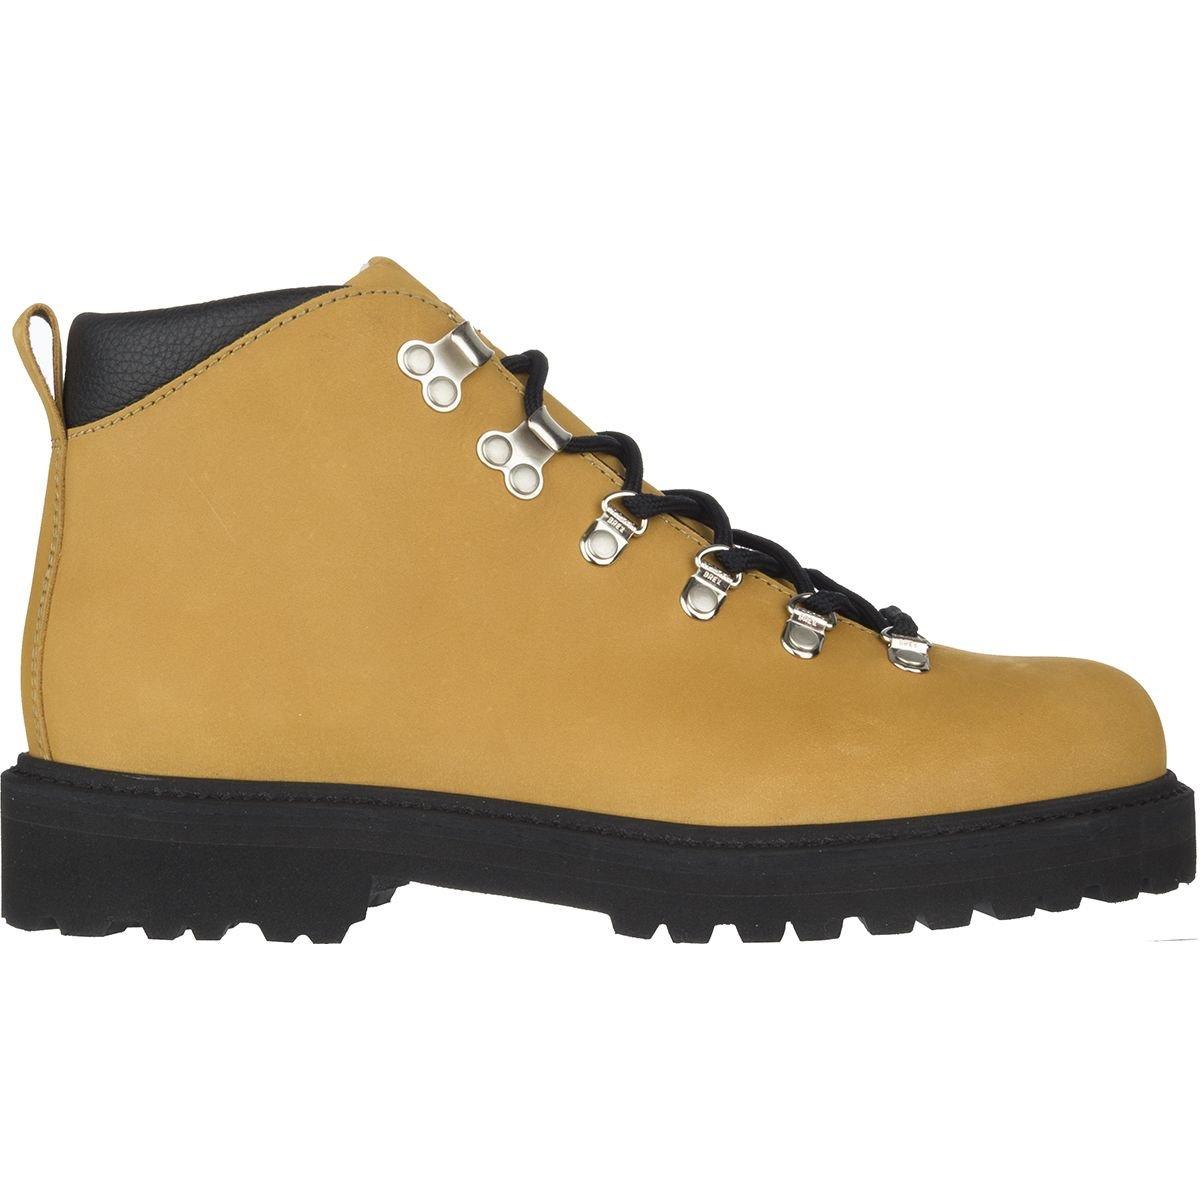 SCARPA Prime Women's X Lite Boot - Women's Prime B077GZGP9M 41.5 EU|Natural 691ea9